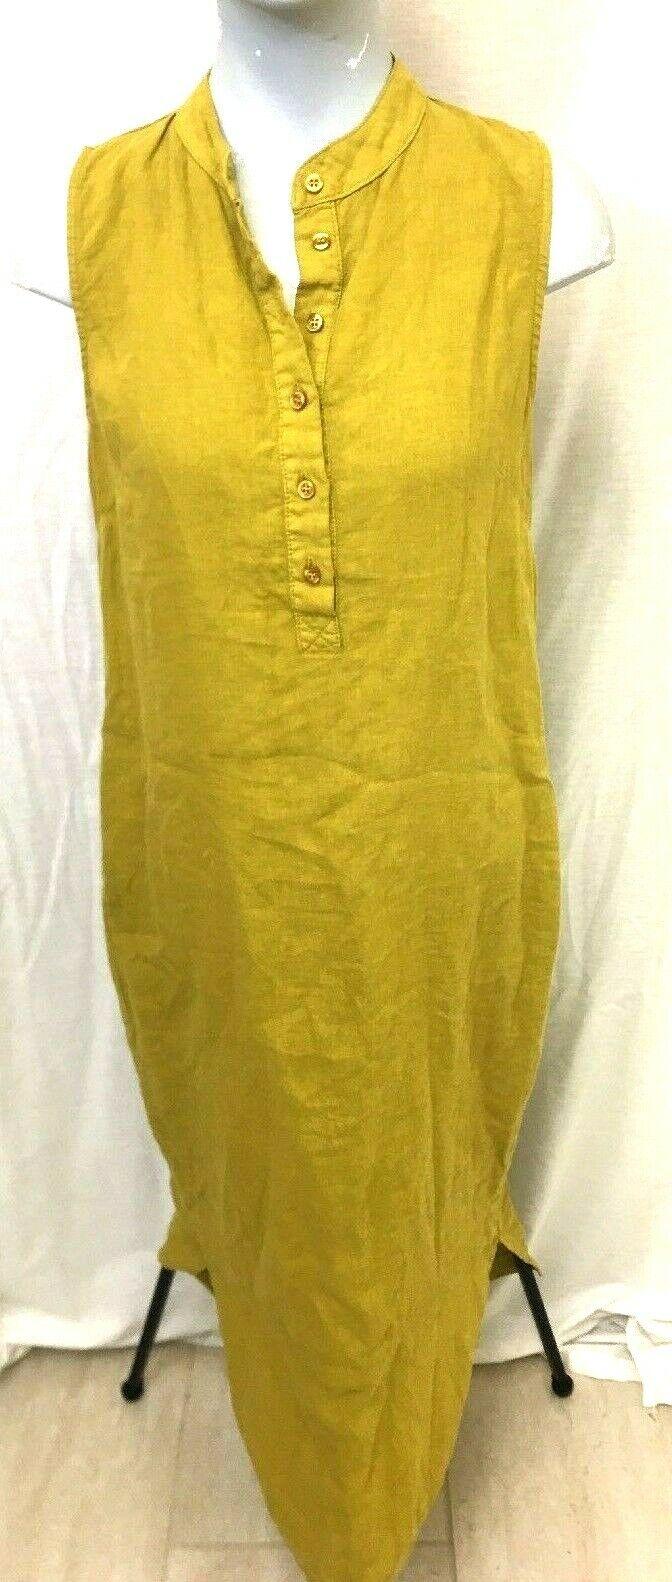 Comme Il Faut  damen's Art to wear Lagenlook Linen Maxi full Dress Sz L1 M1